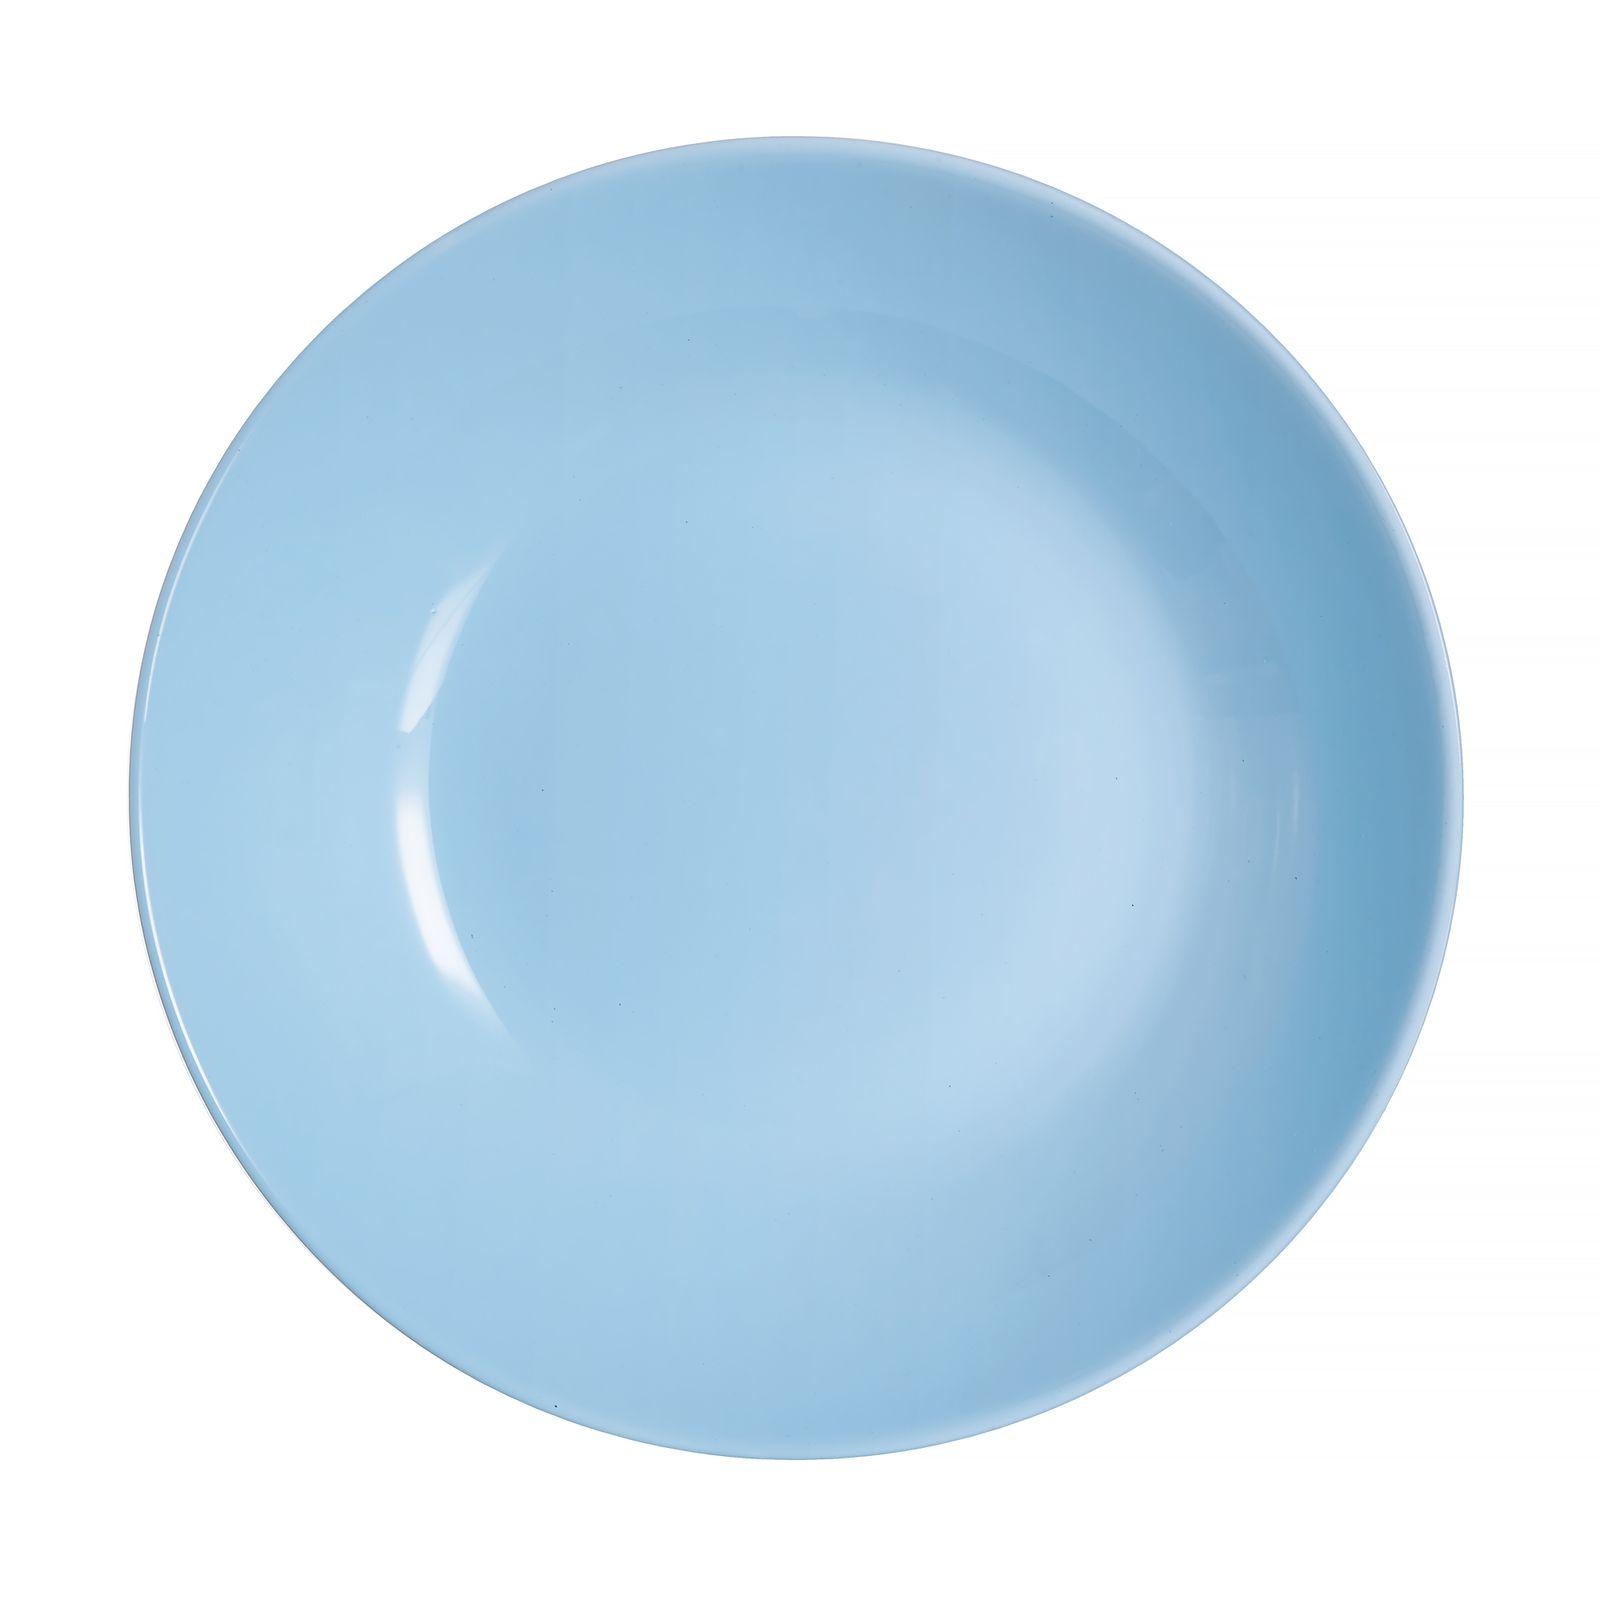 Talerz głęboki Diwali Light Blue 20 cm LUMINARC